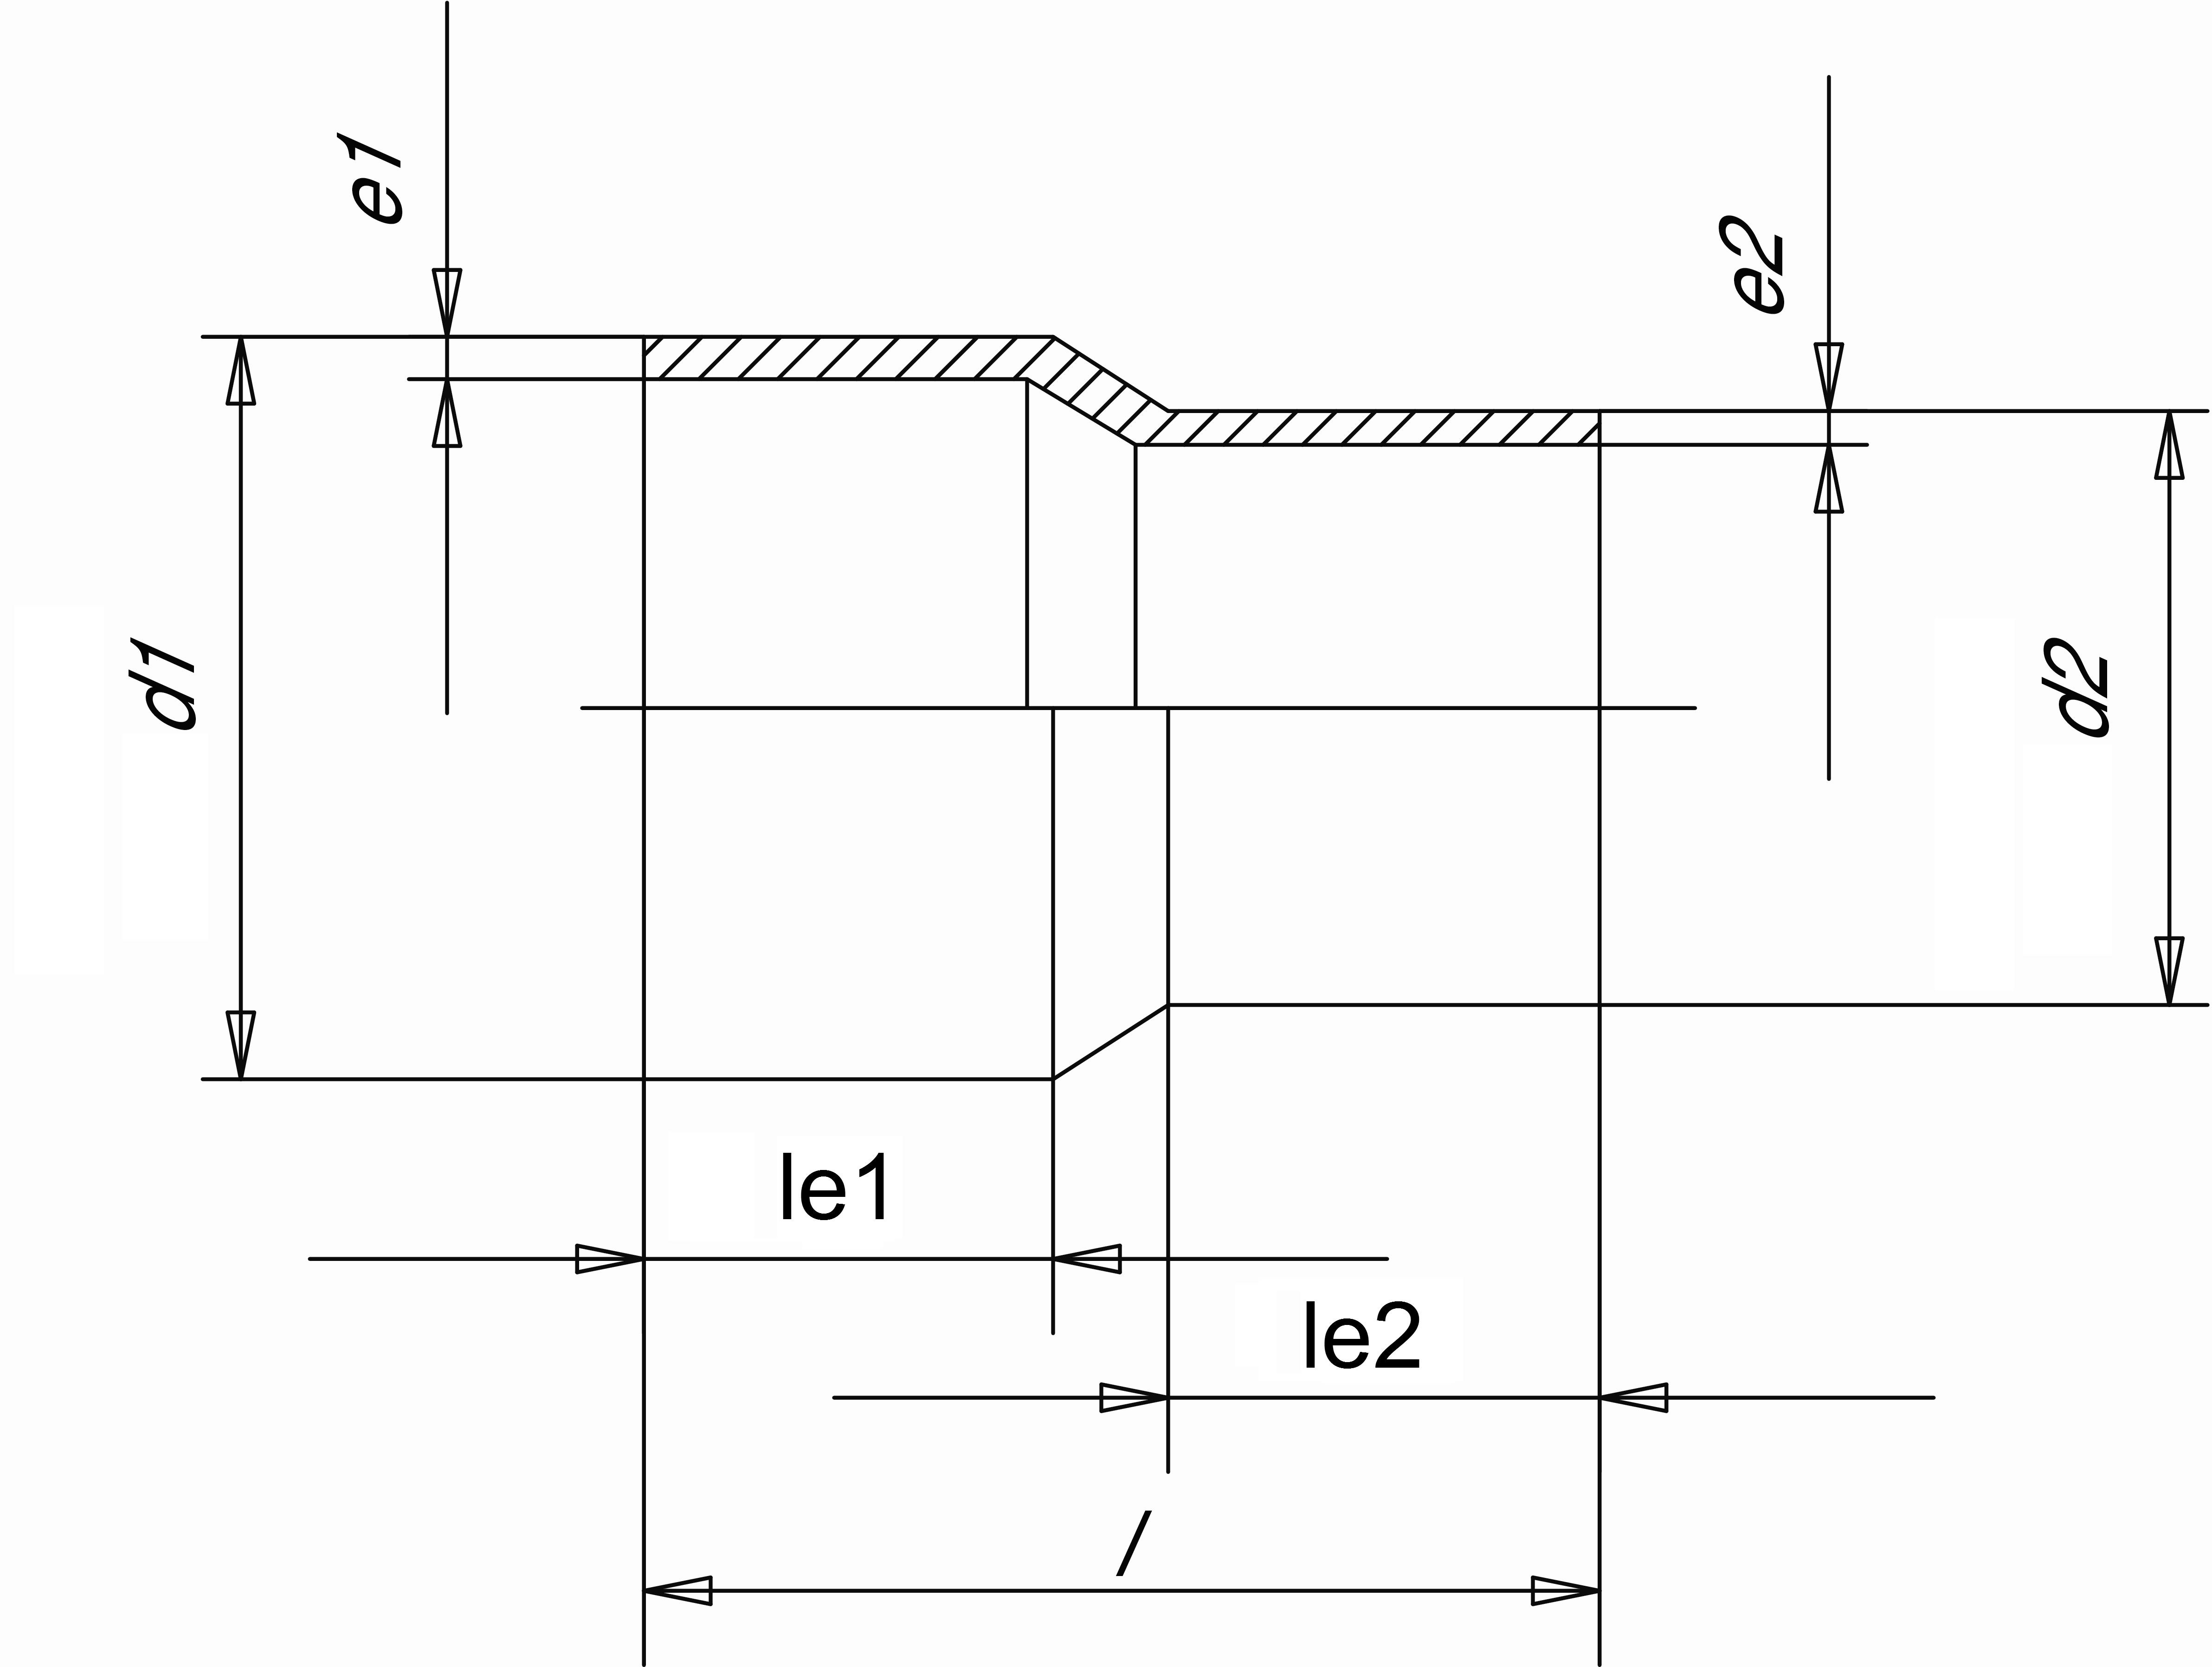 Муфта редукционная (Simona) SDR21 PN16 25x20